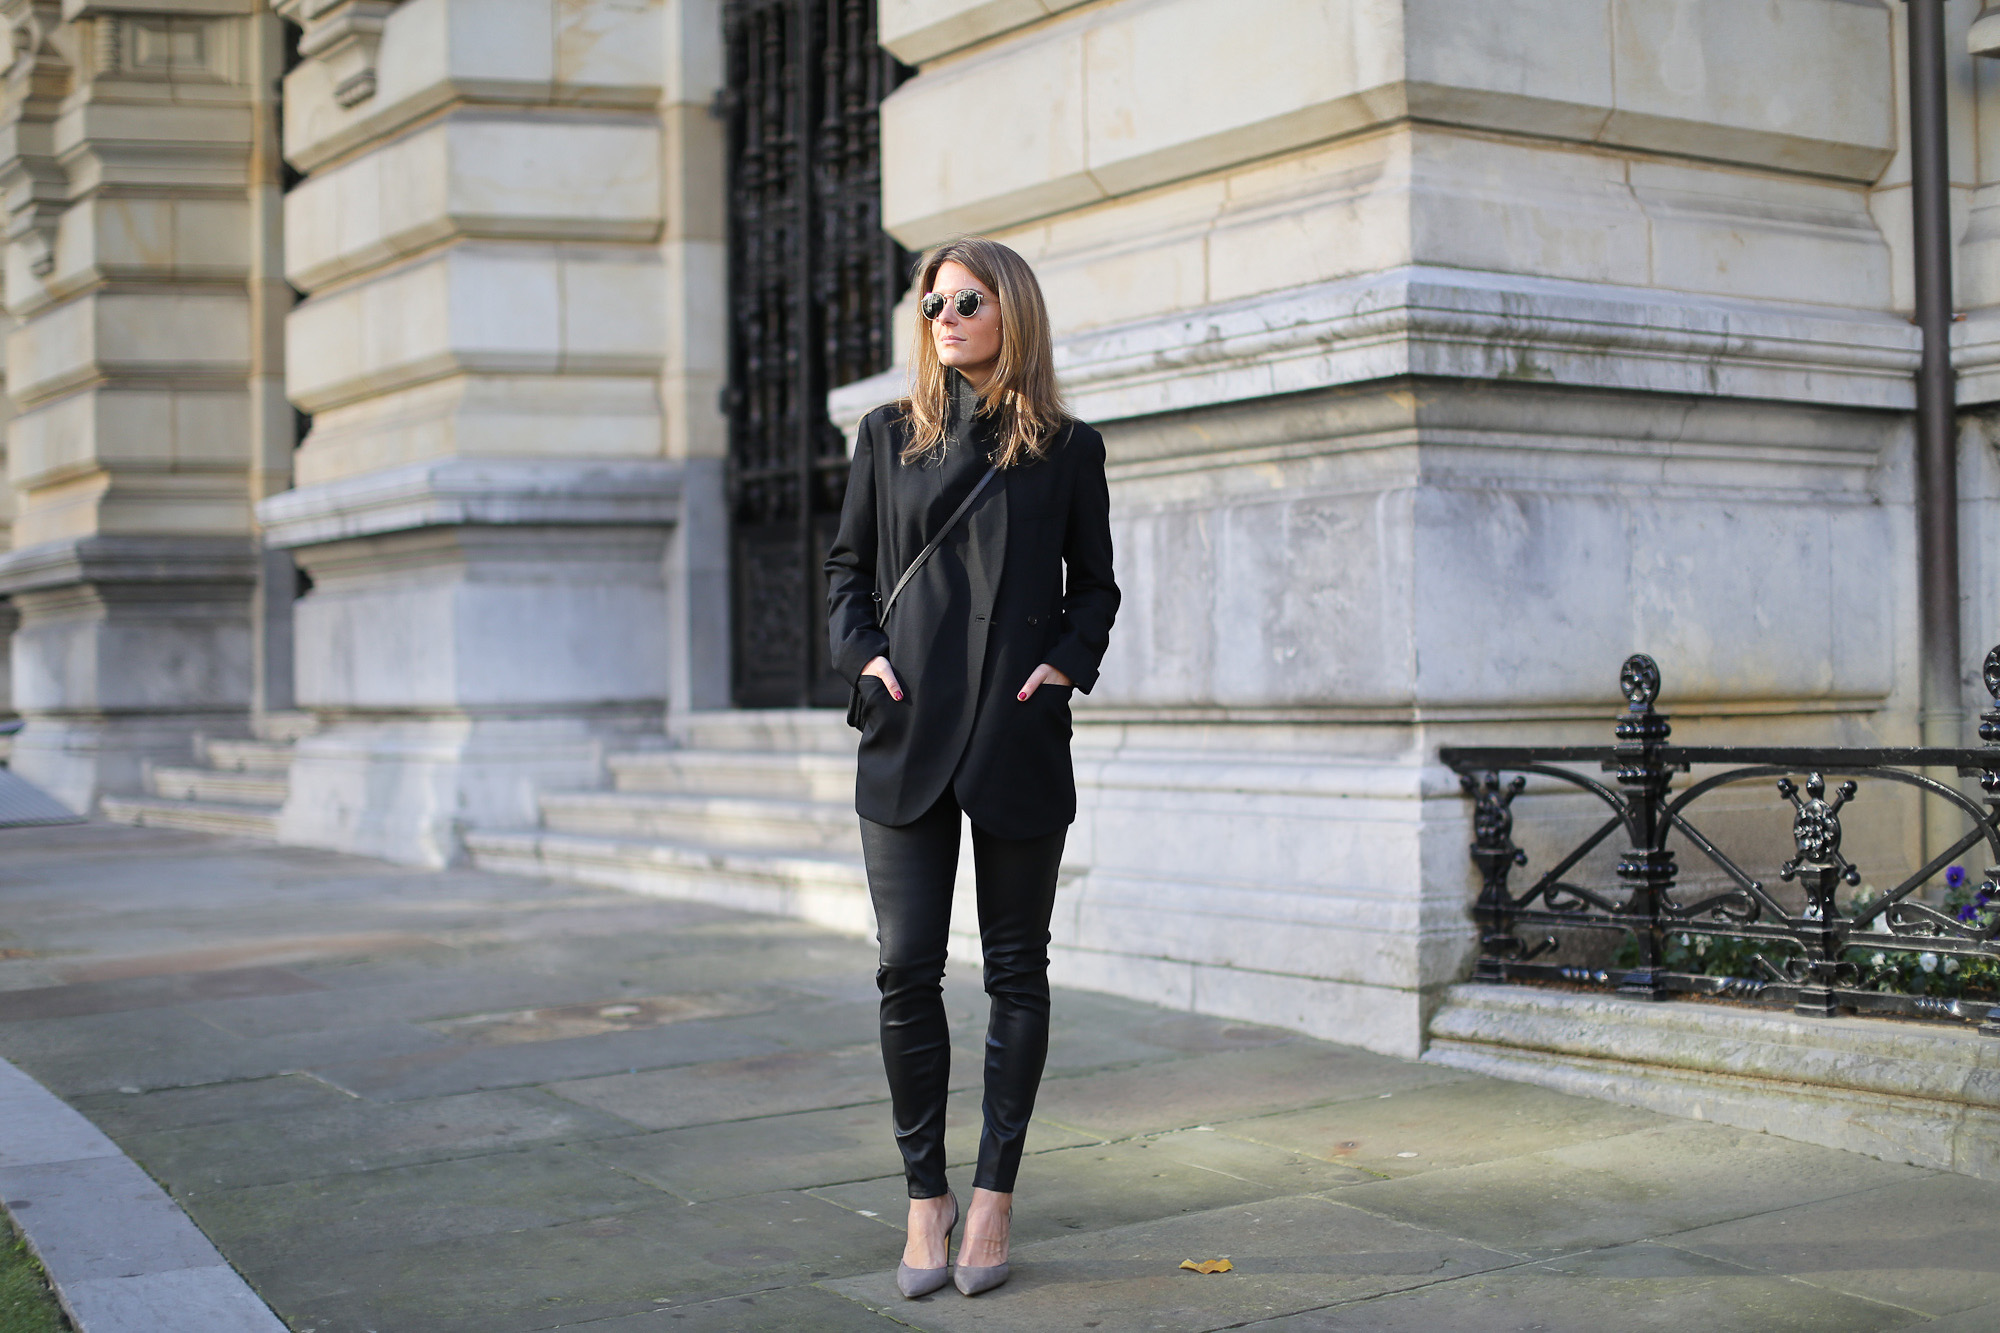 Clochet_streetstyle_boxcalf_pantalones_piel_kalam_sonia_rykiel_blazer